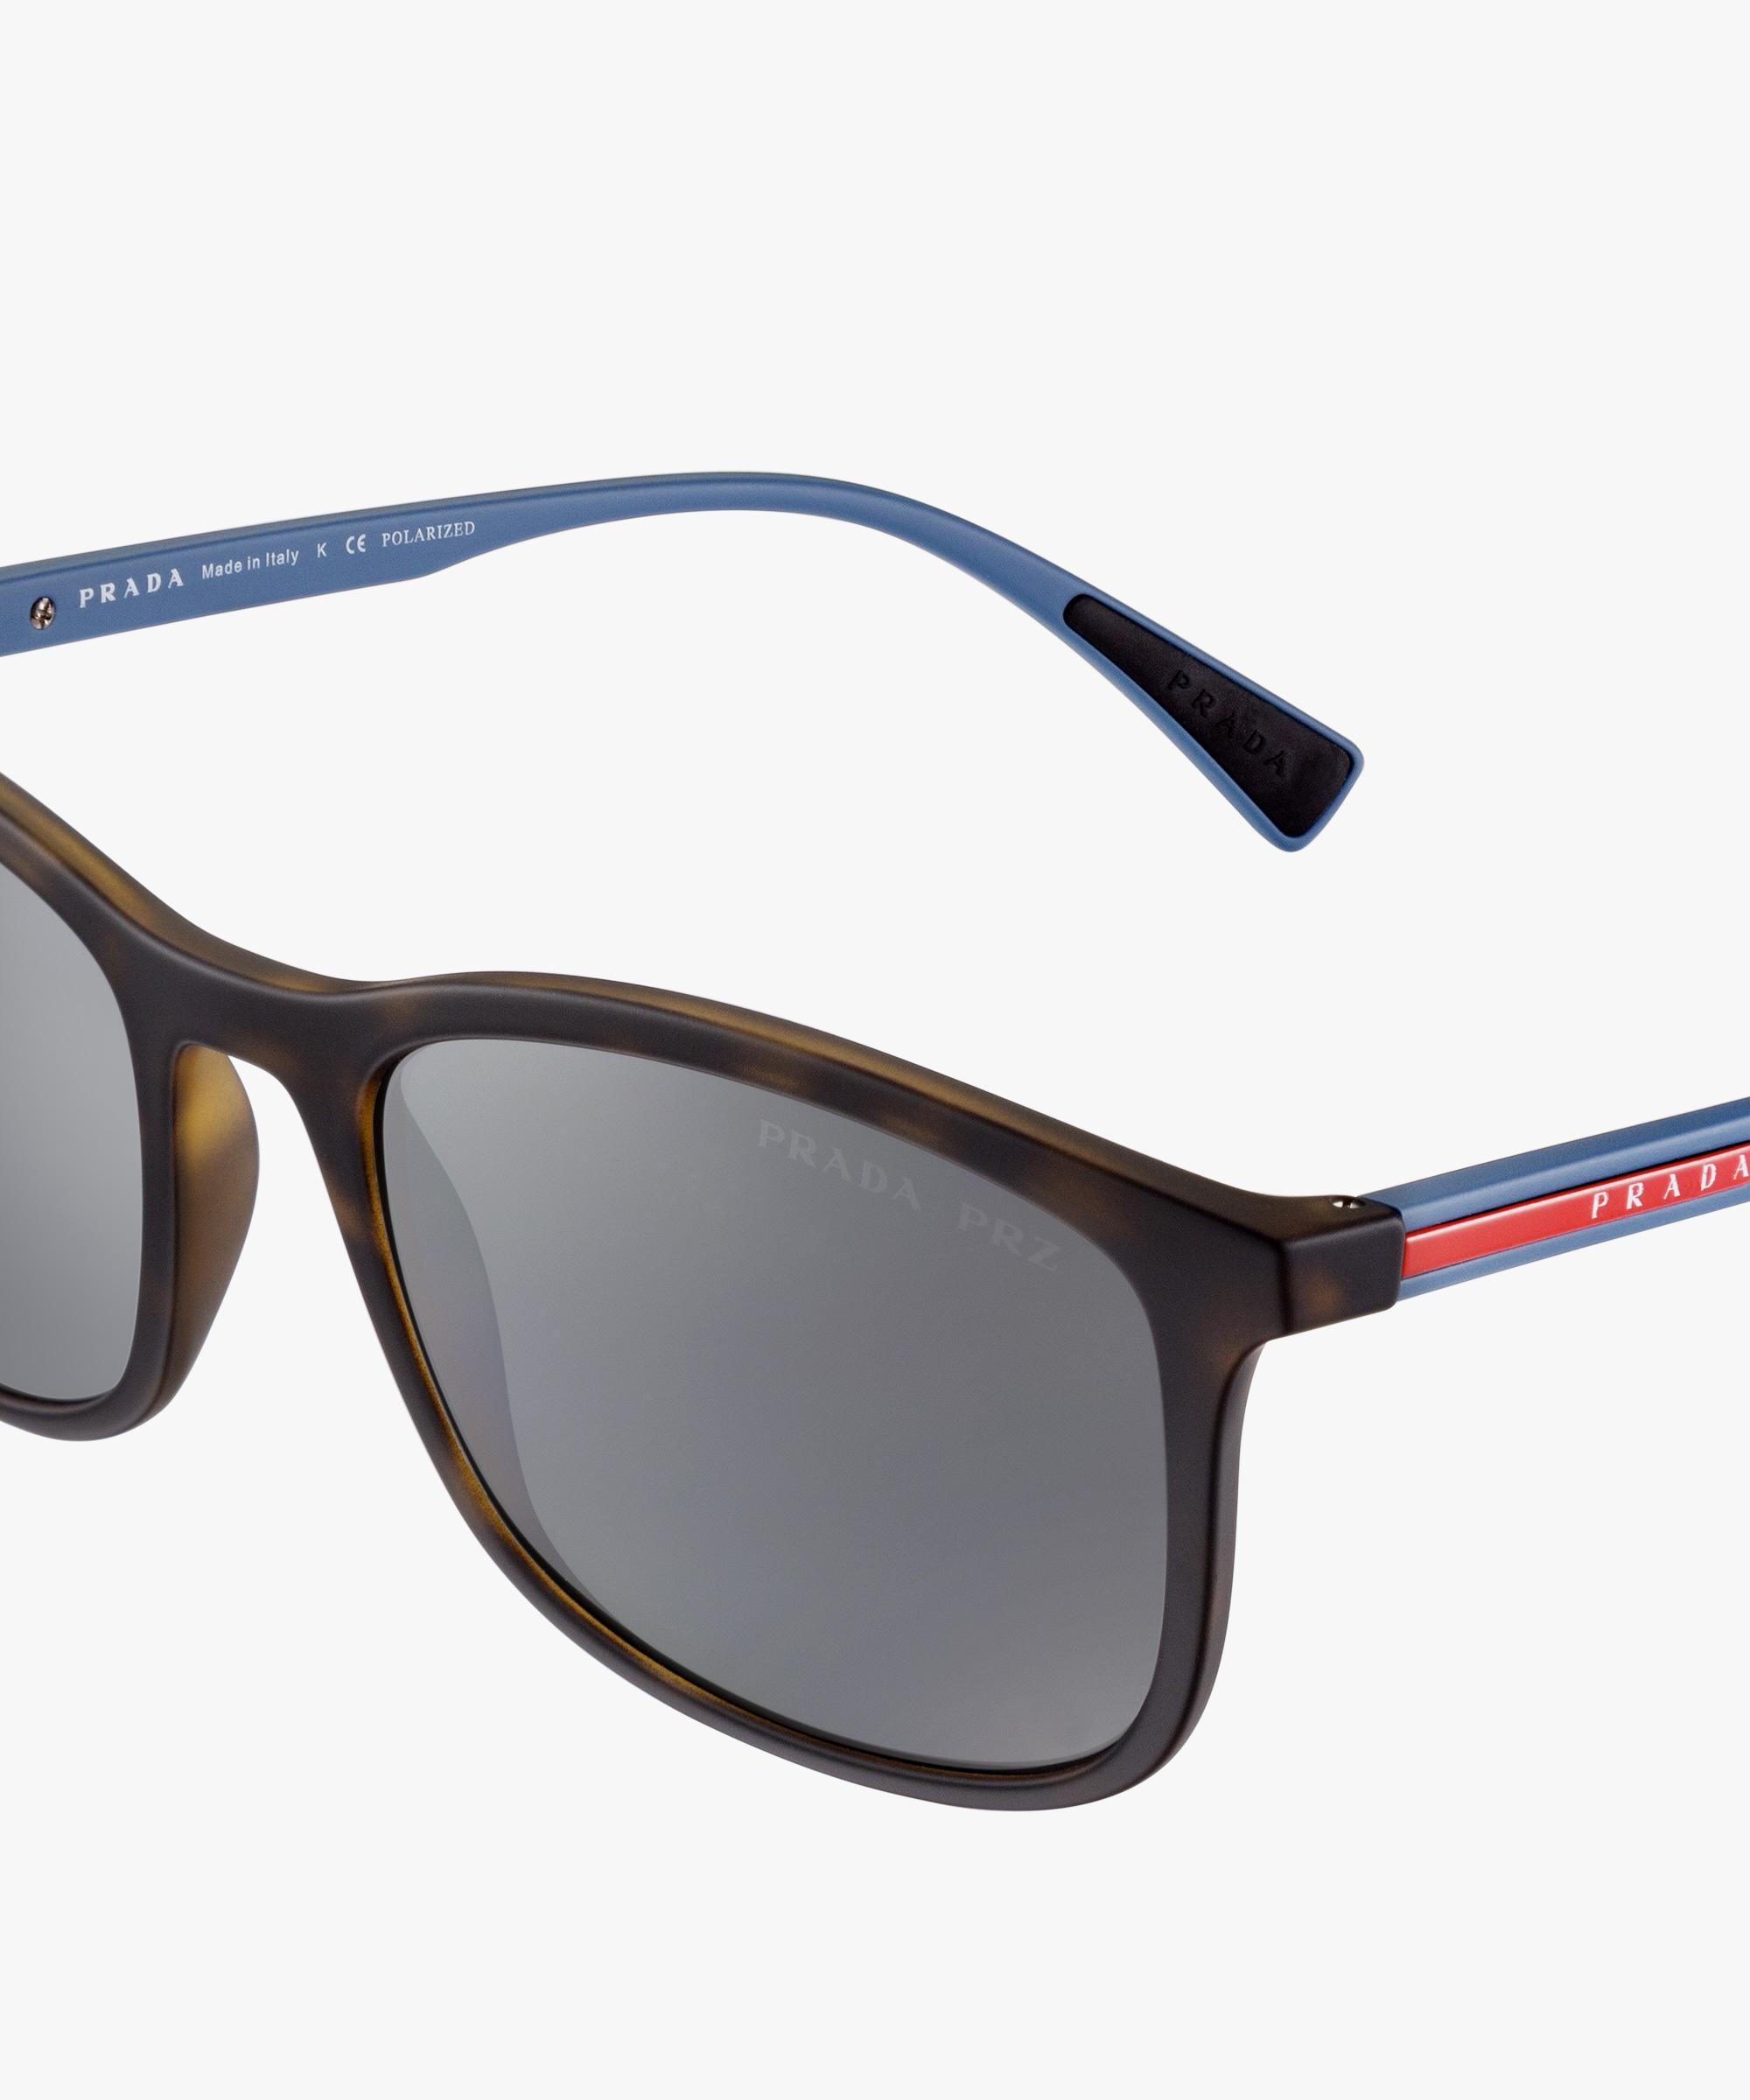 dec2e8e2ca Prada Linea Rossa Eyewear Collection Prada POLARIZED SLATE GRAY LENSES.